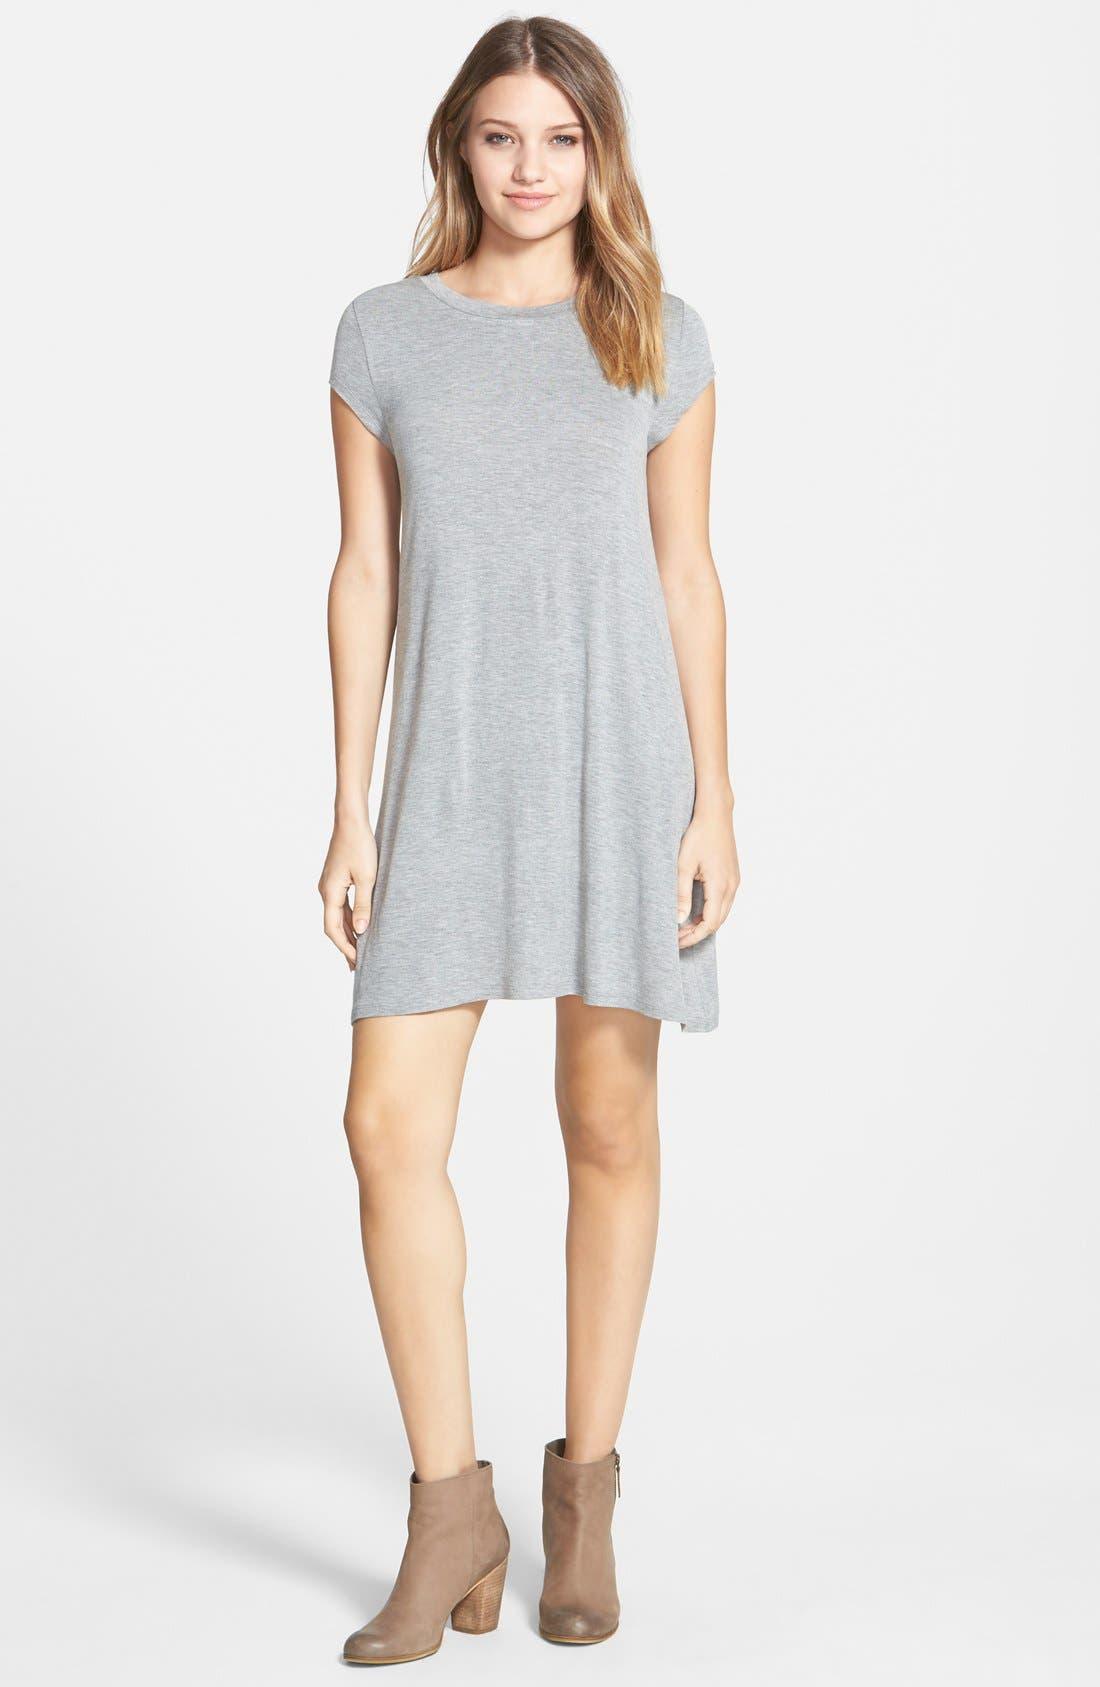 Alternate Image 1 Selected - Billabong 'Last Minute' T-Shirt Dress